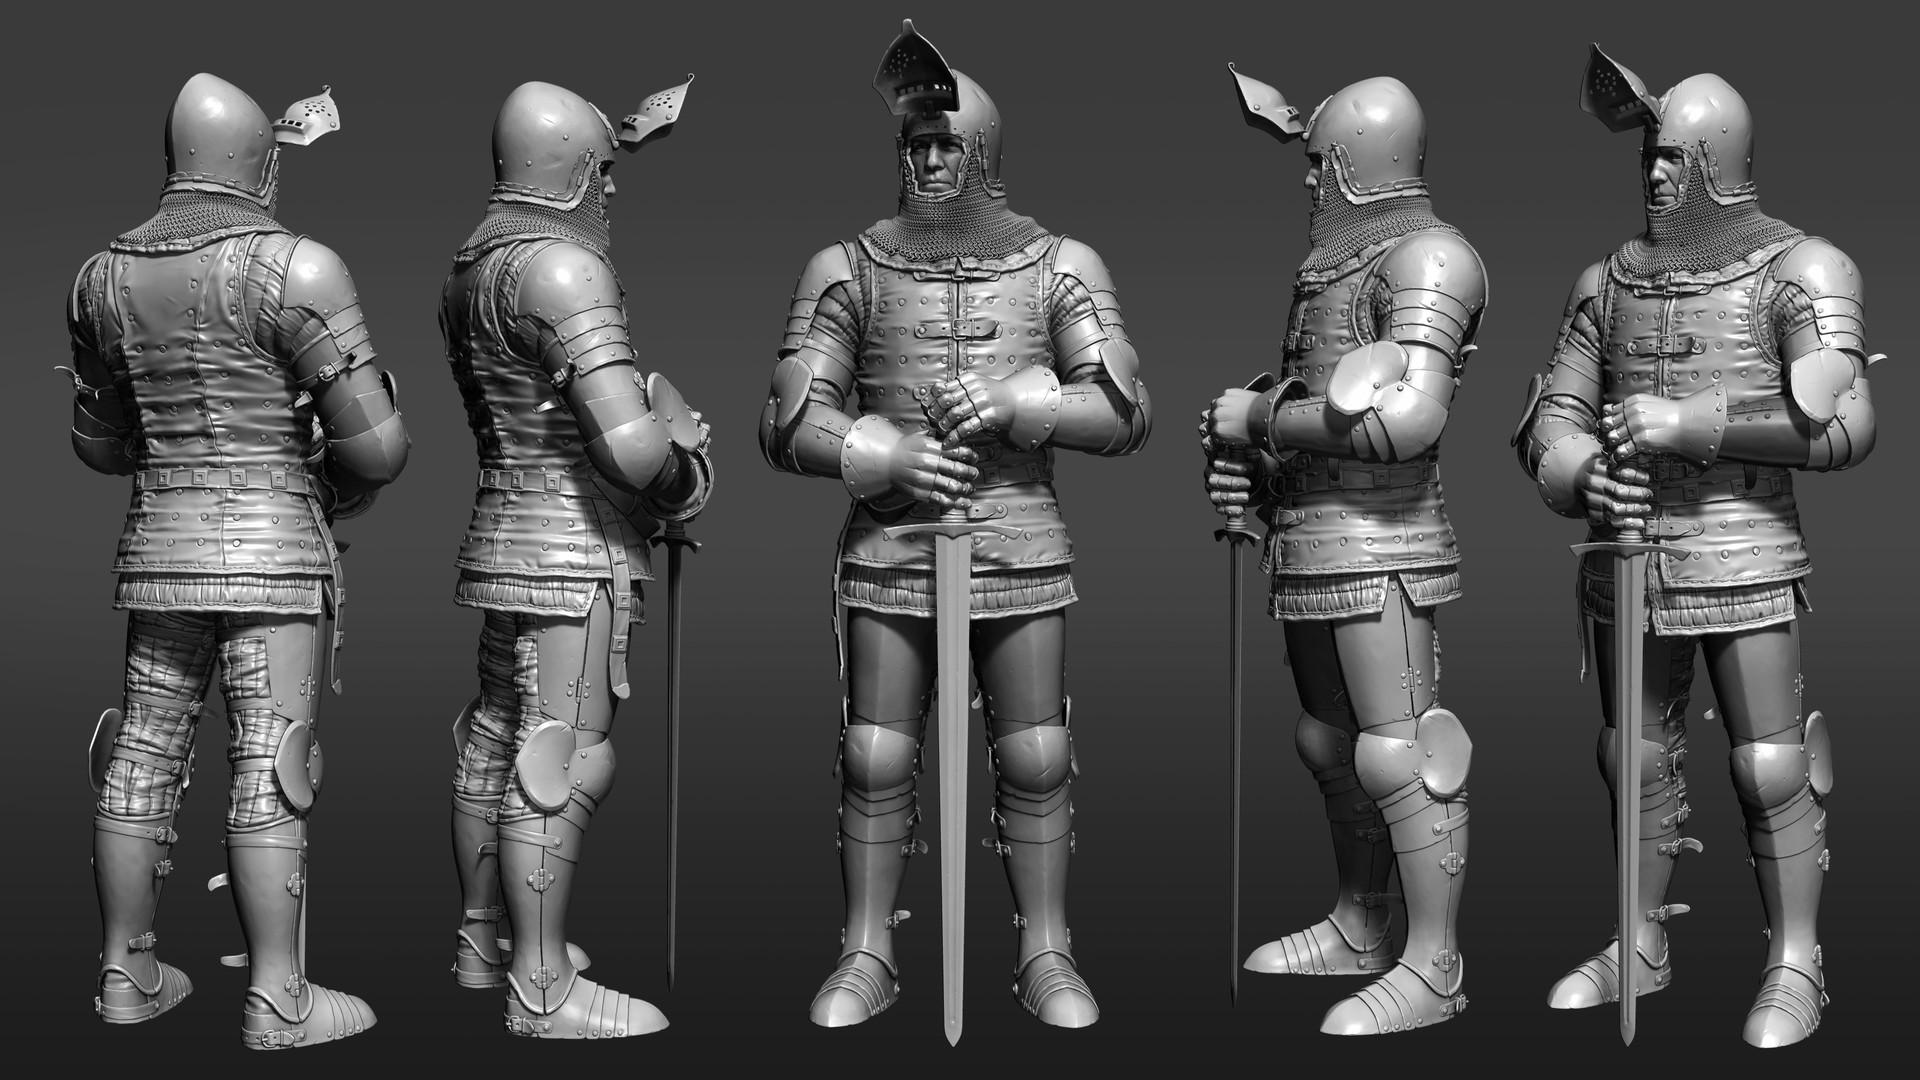 Petr sokolov artpity knight hp side